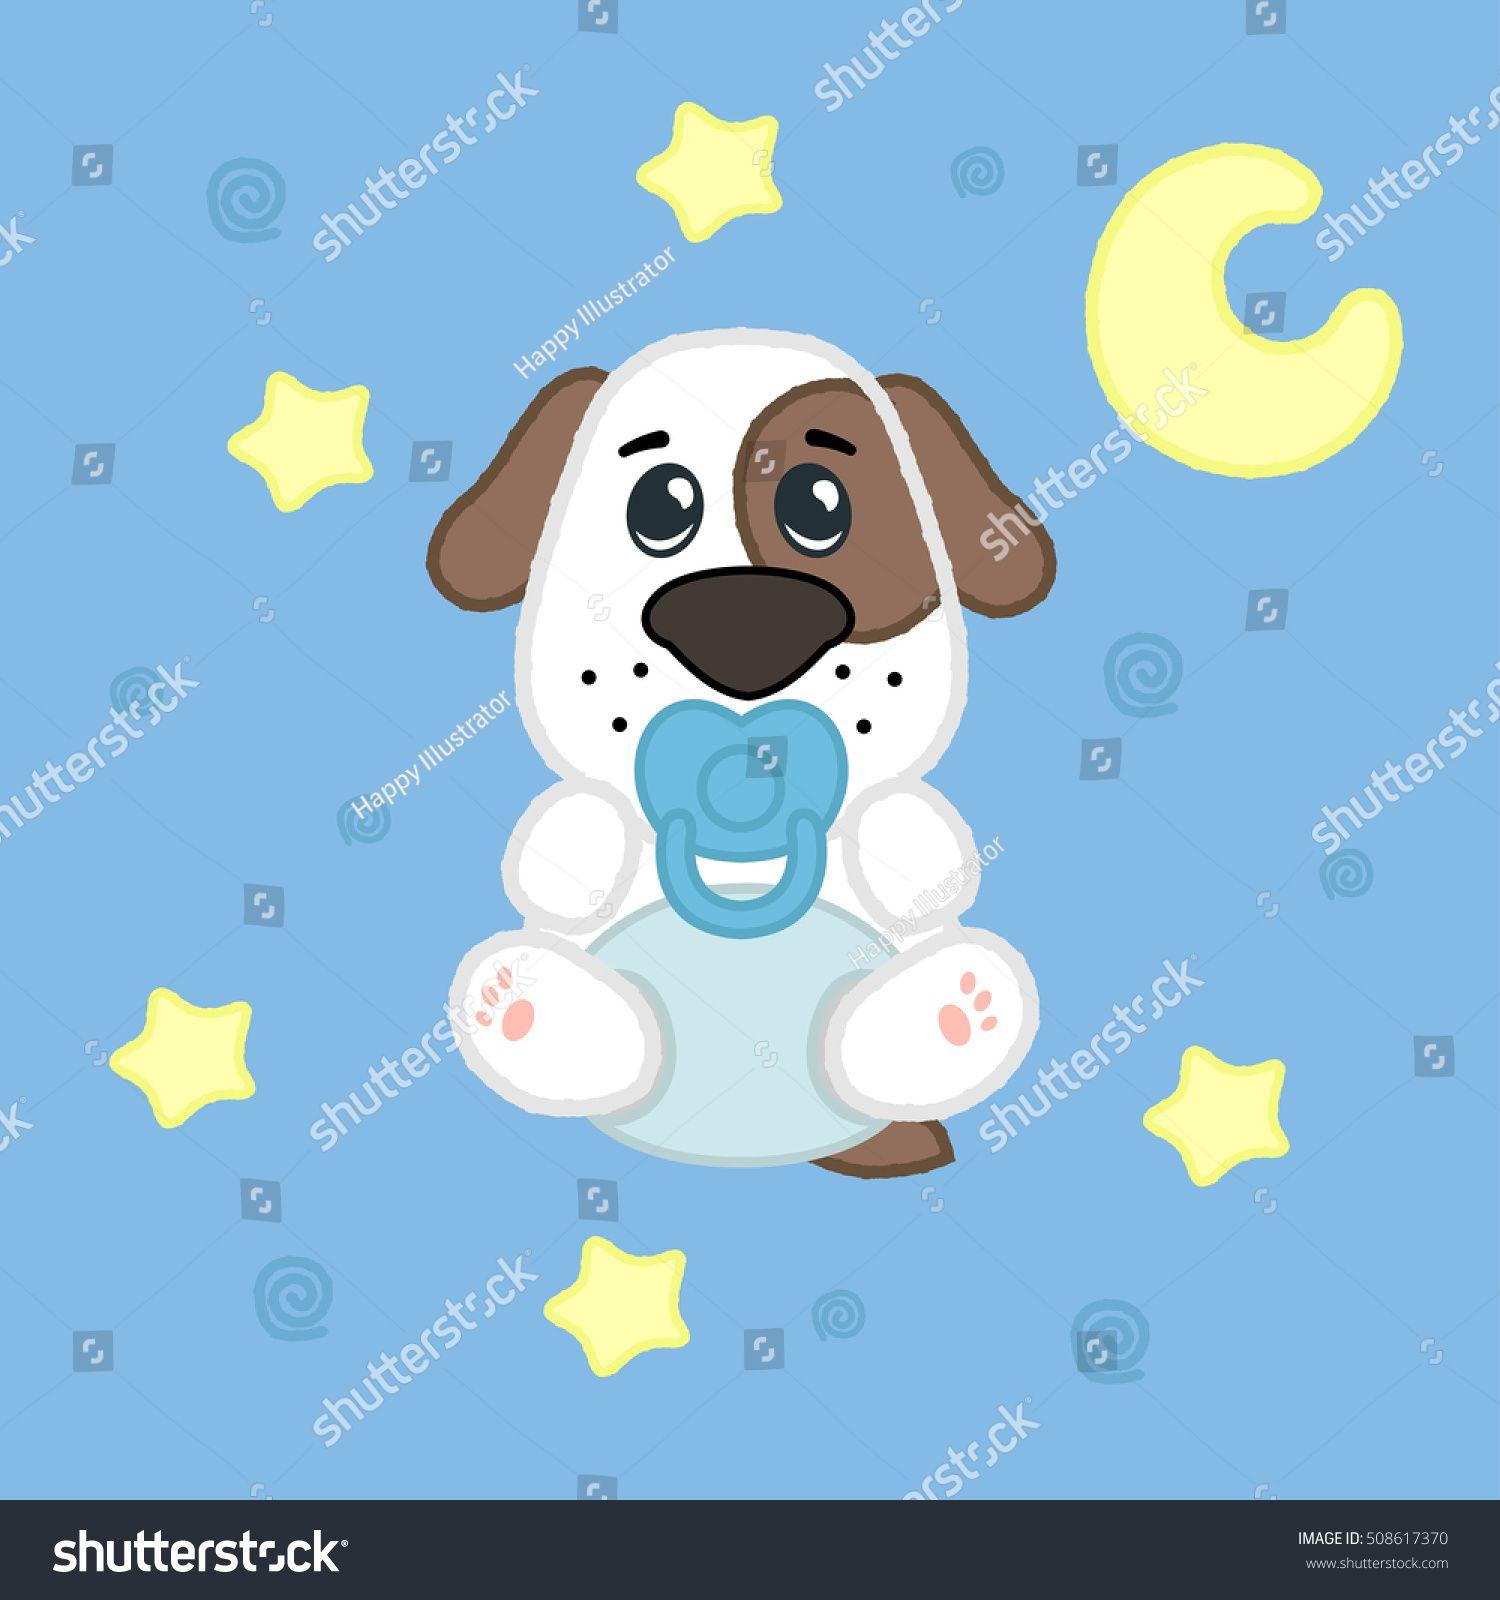 Best Black Chubby Adorable Dog - da7f919b106c5d7489f6fbfa6a652a89  You Should Have_136140  .jpg